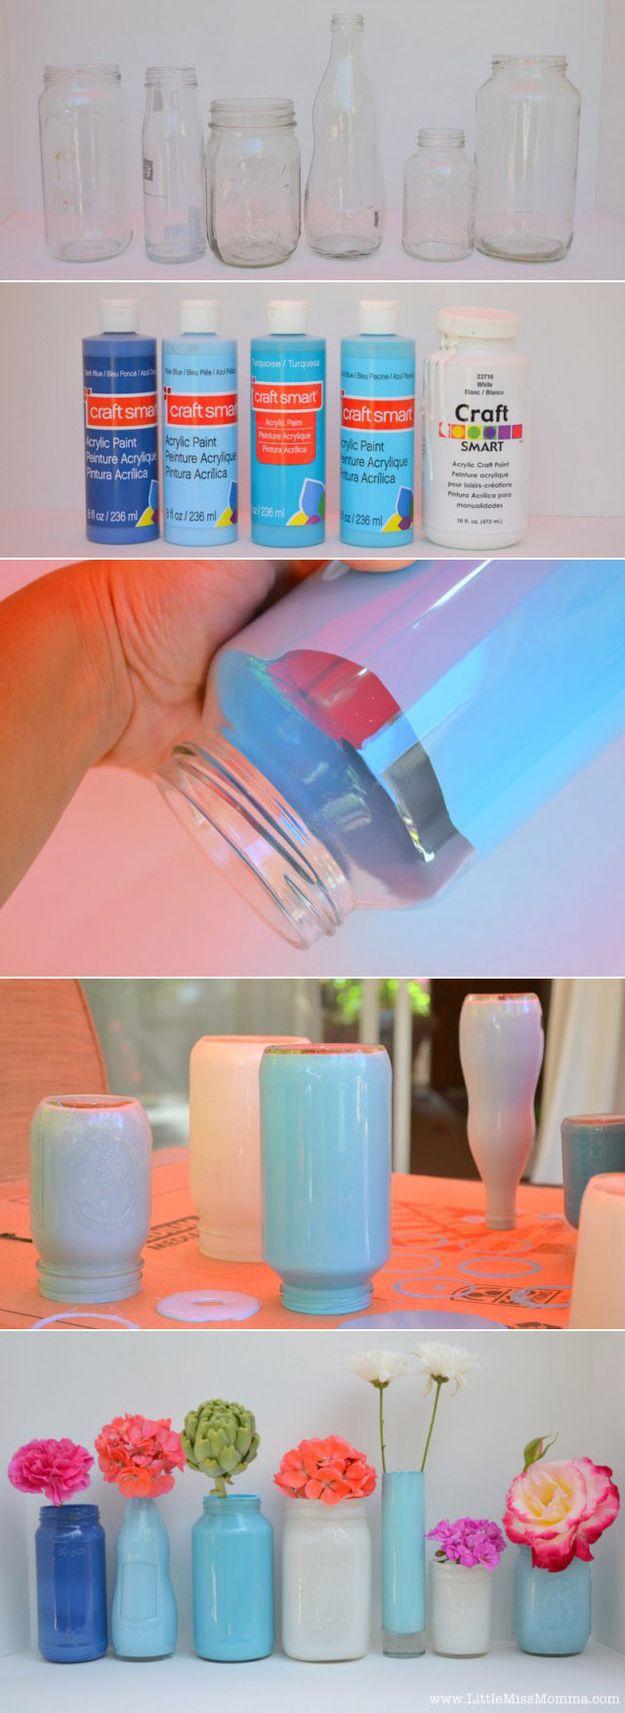 41 ideas for mason jars @Melissa Squires Squires Squires Squires Squires Squires Revell